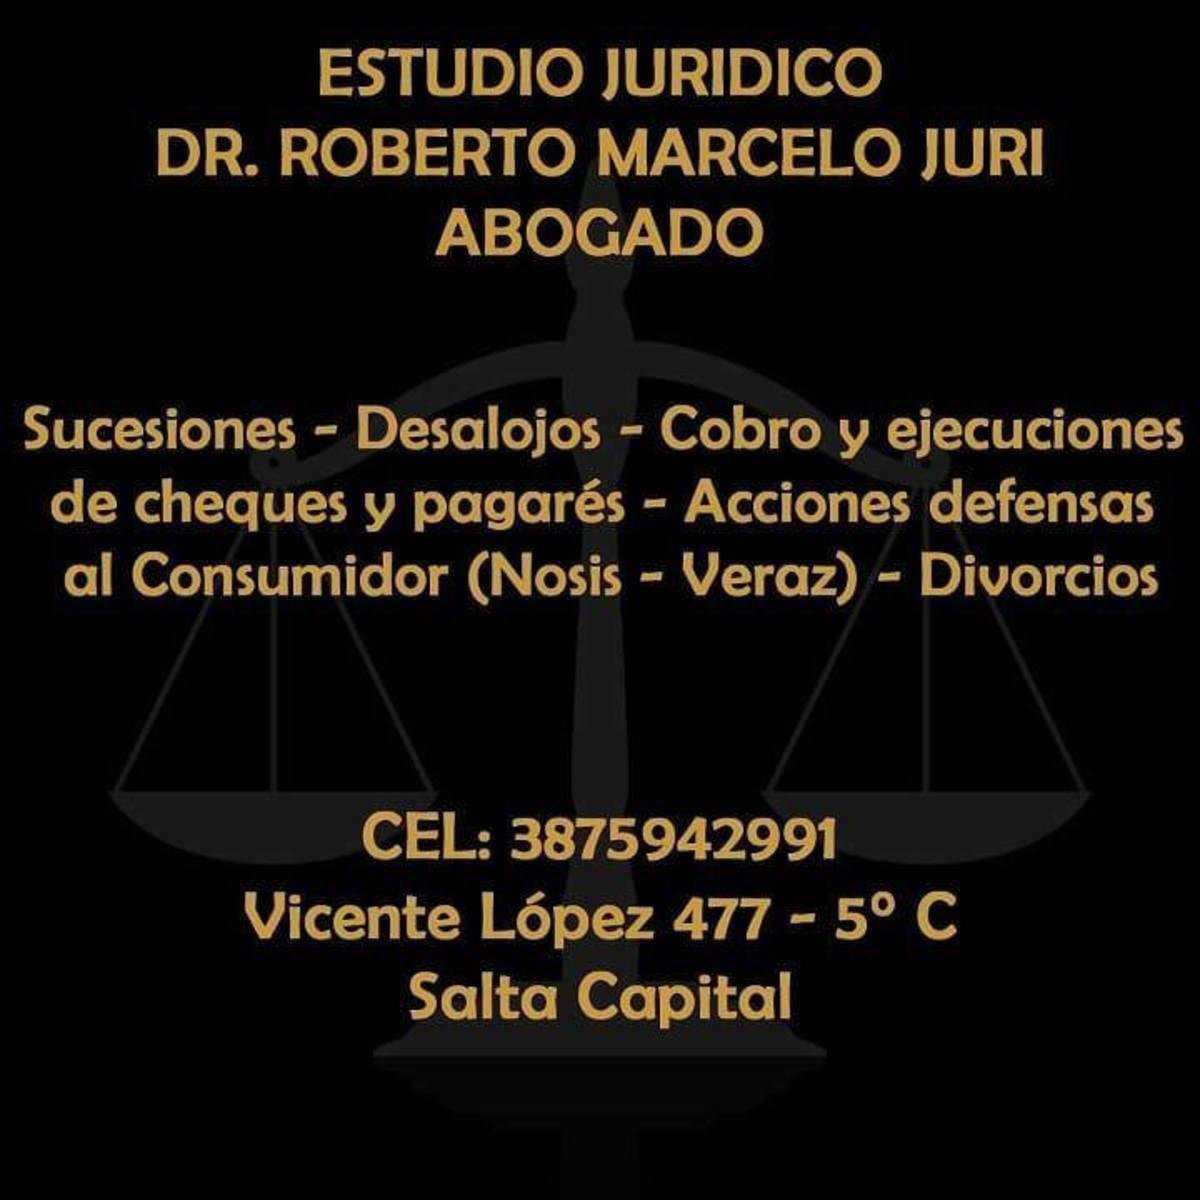 ABOGADO LABORALISTA DR ROBERTO MARCELO JURI